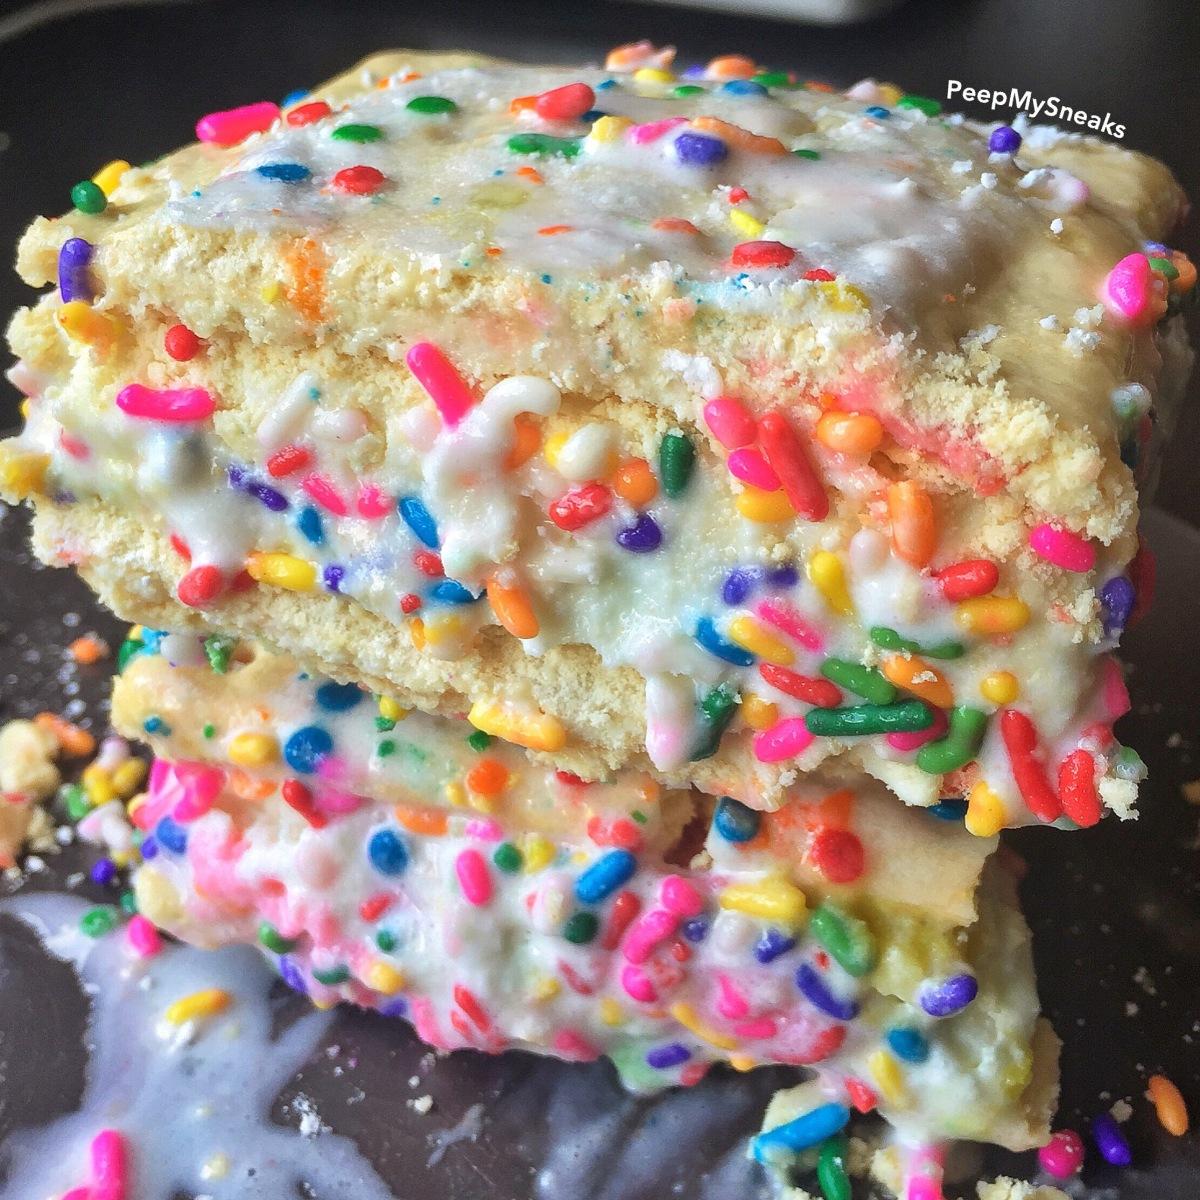 Deep Fried Birthday Cake Pop Tart Ice Cream Sandwich